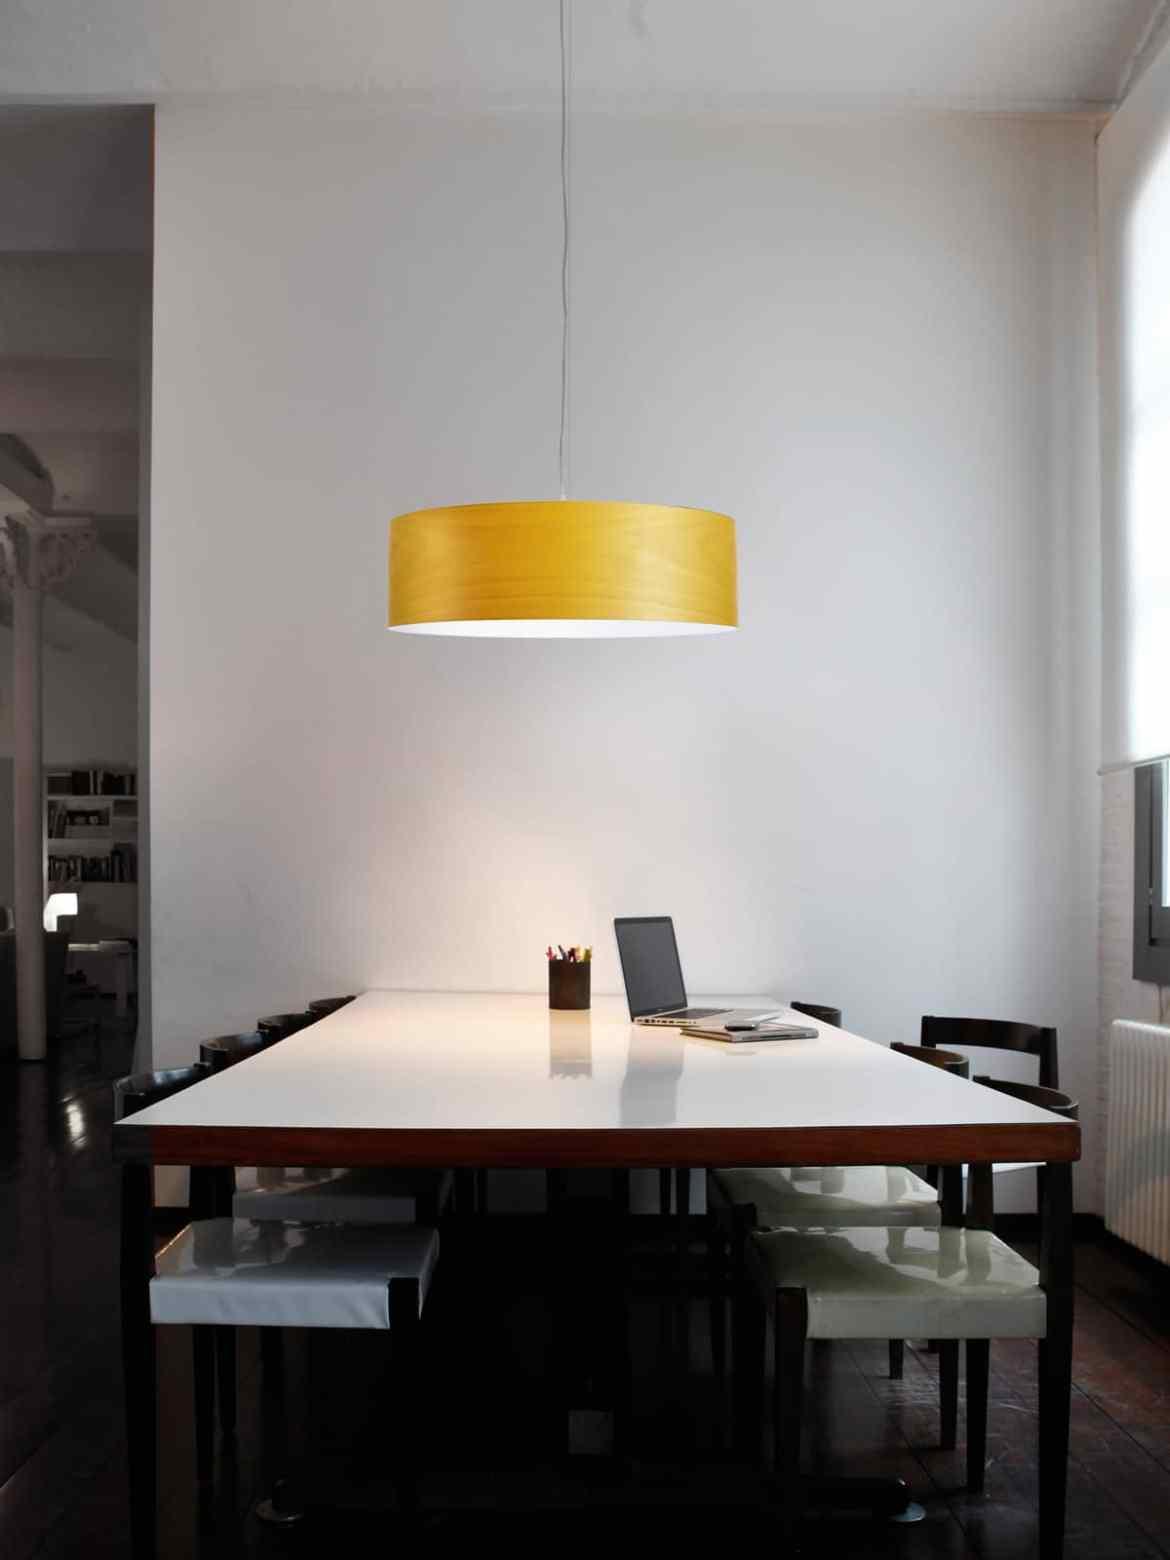 DesignOrt Blog: Designer im Portrait: Mariví Calvo Pendelleuchte Super Gea LZF Gelb 24